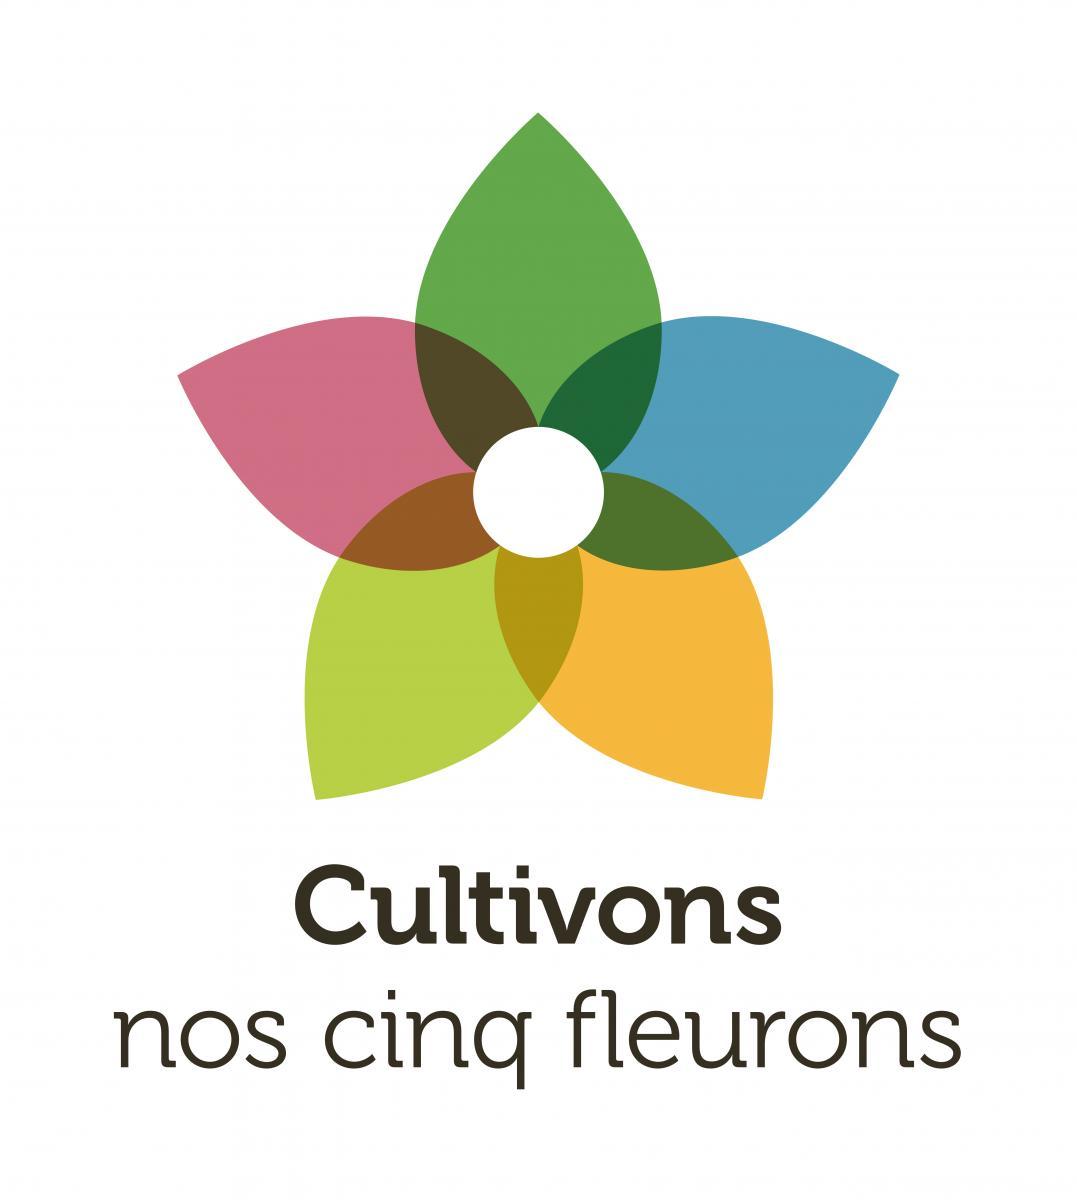 Cultivons nos 5 fleurons